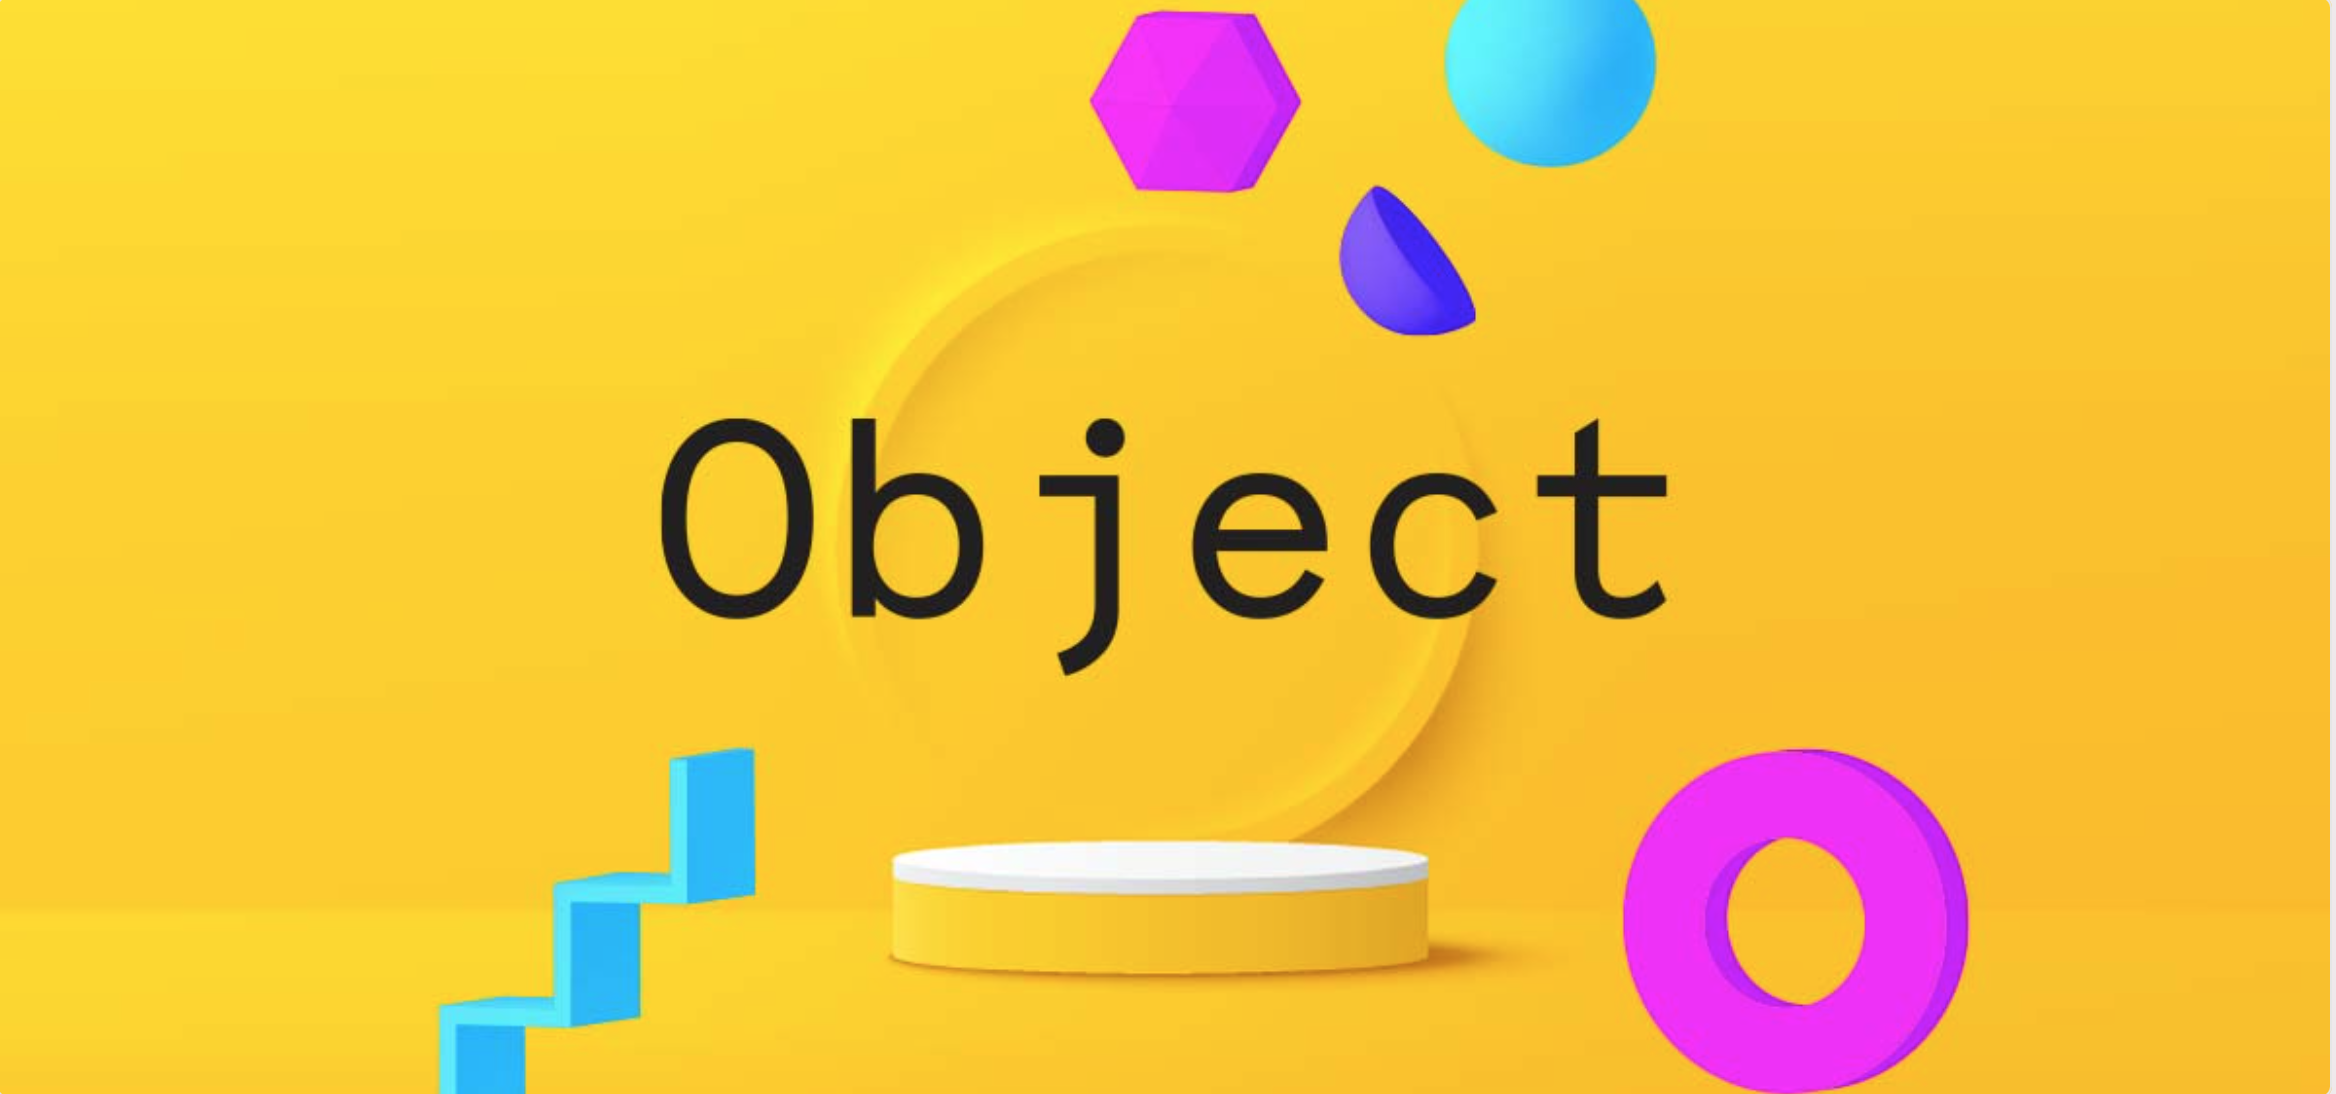 Object Podcast web image